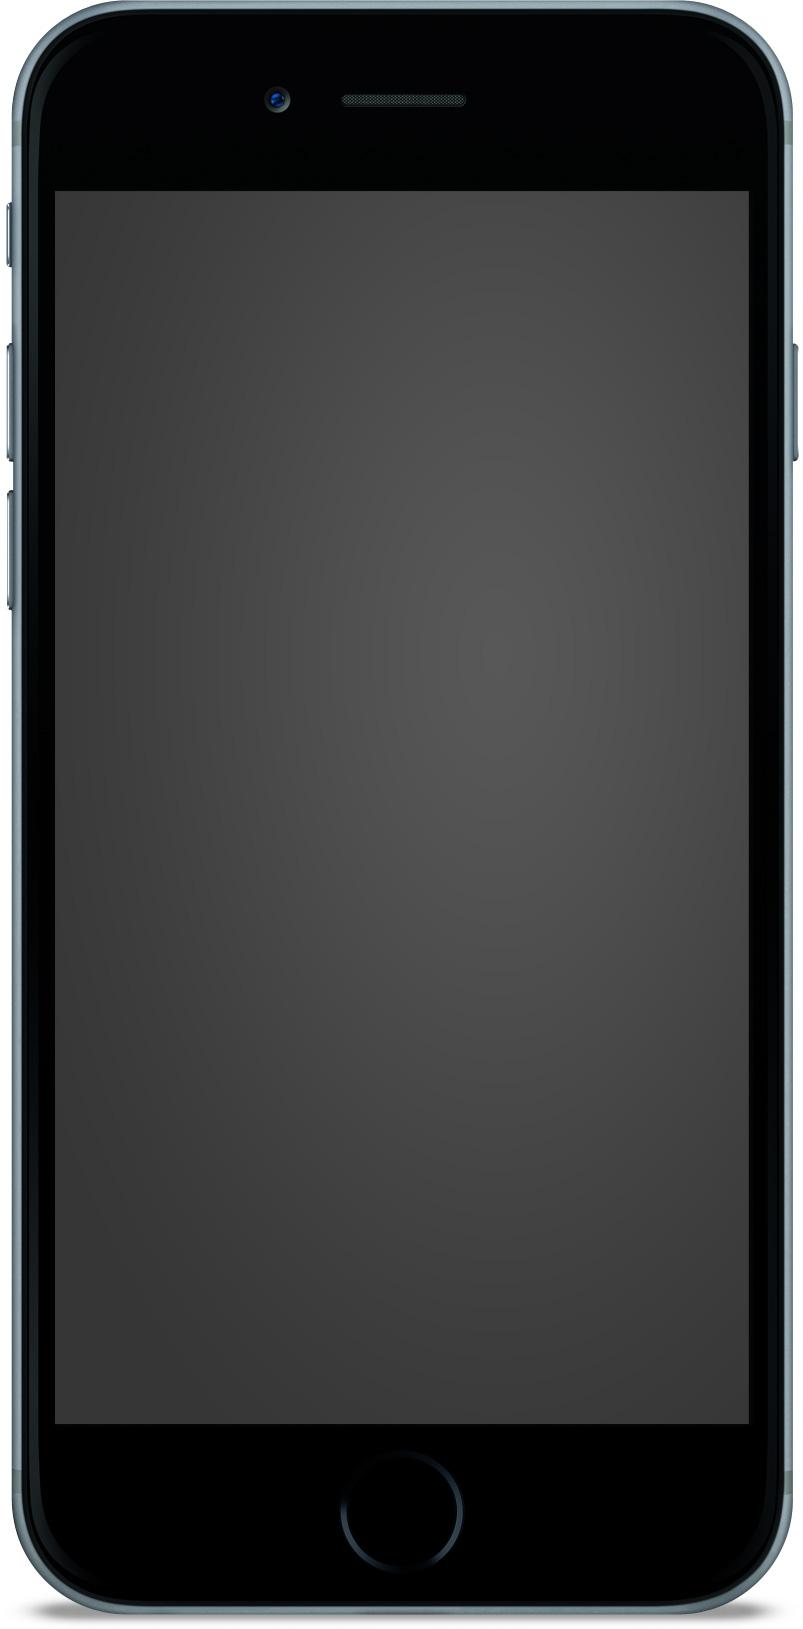 IPhone6 Standing BK Mockup